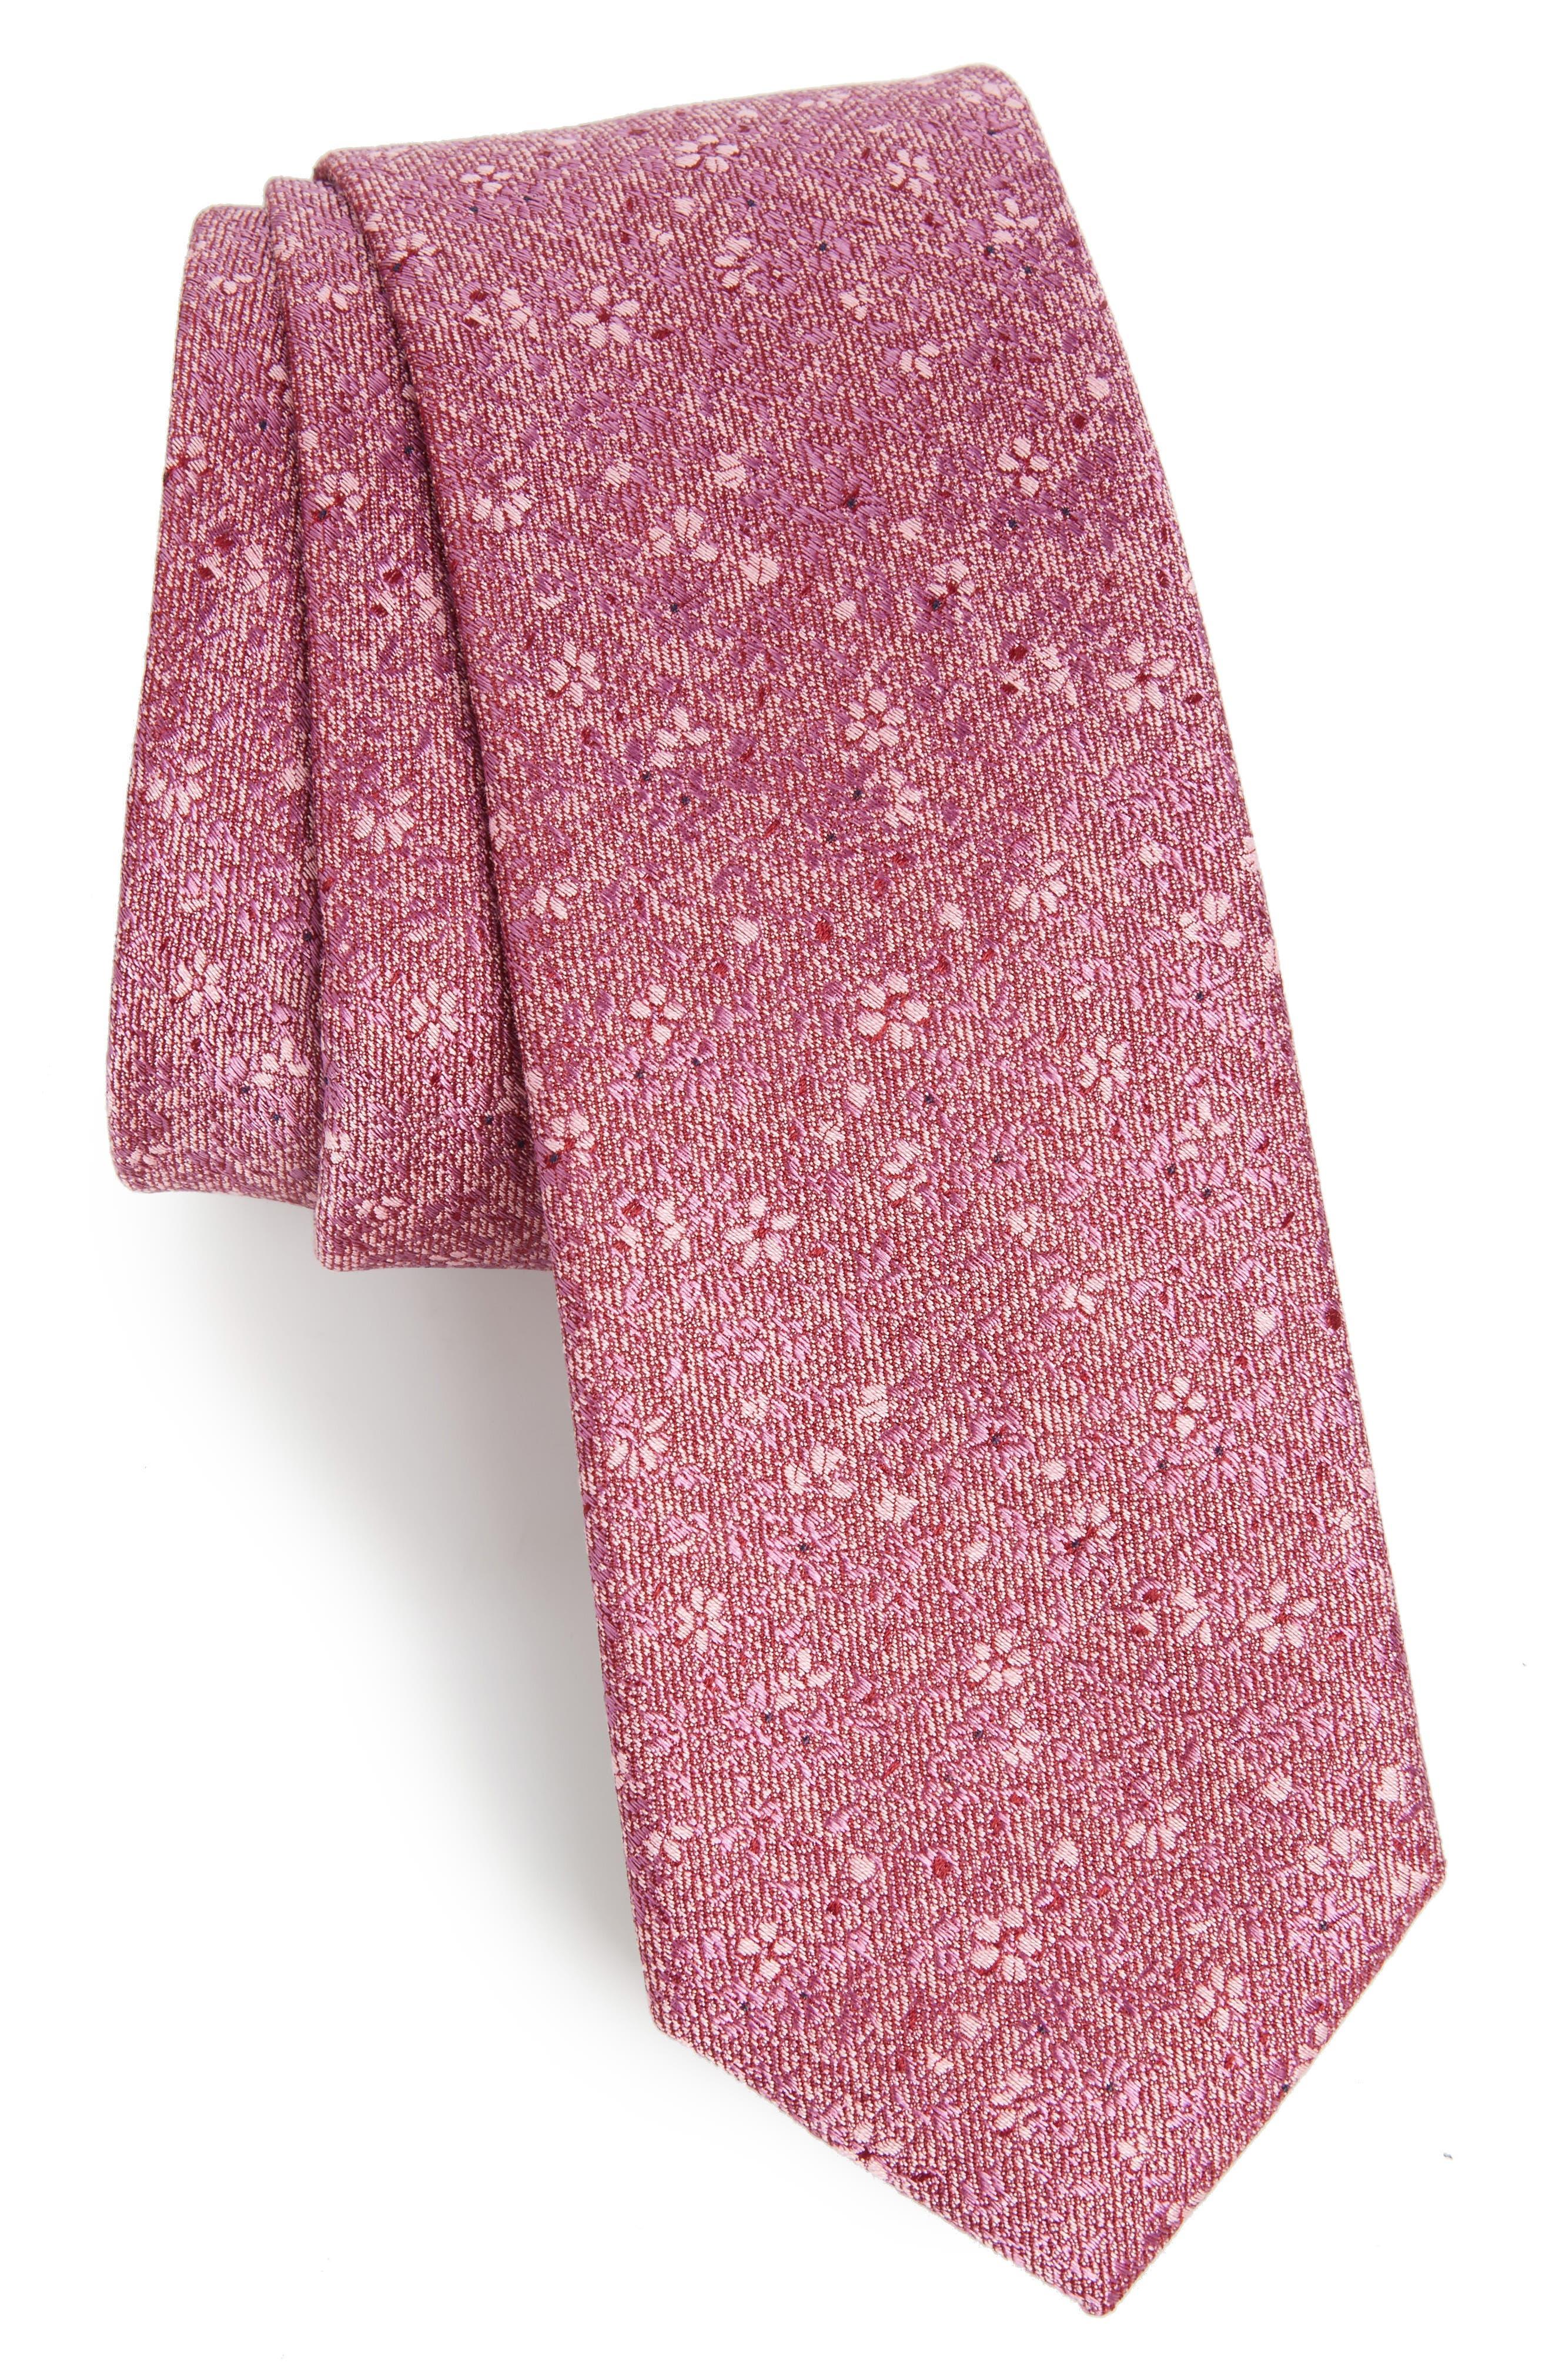 Alternate Image 1 Selected - Calibrate Lindsay Floral Print Silk & Cotton Tie